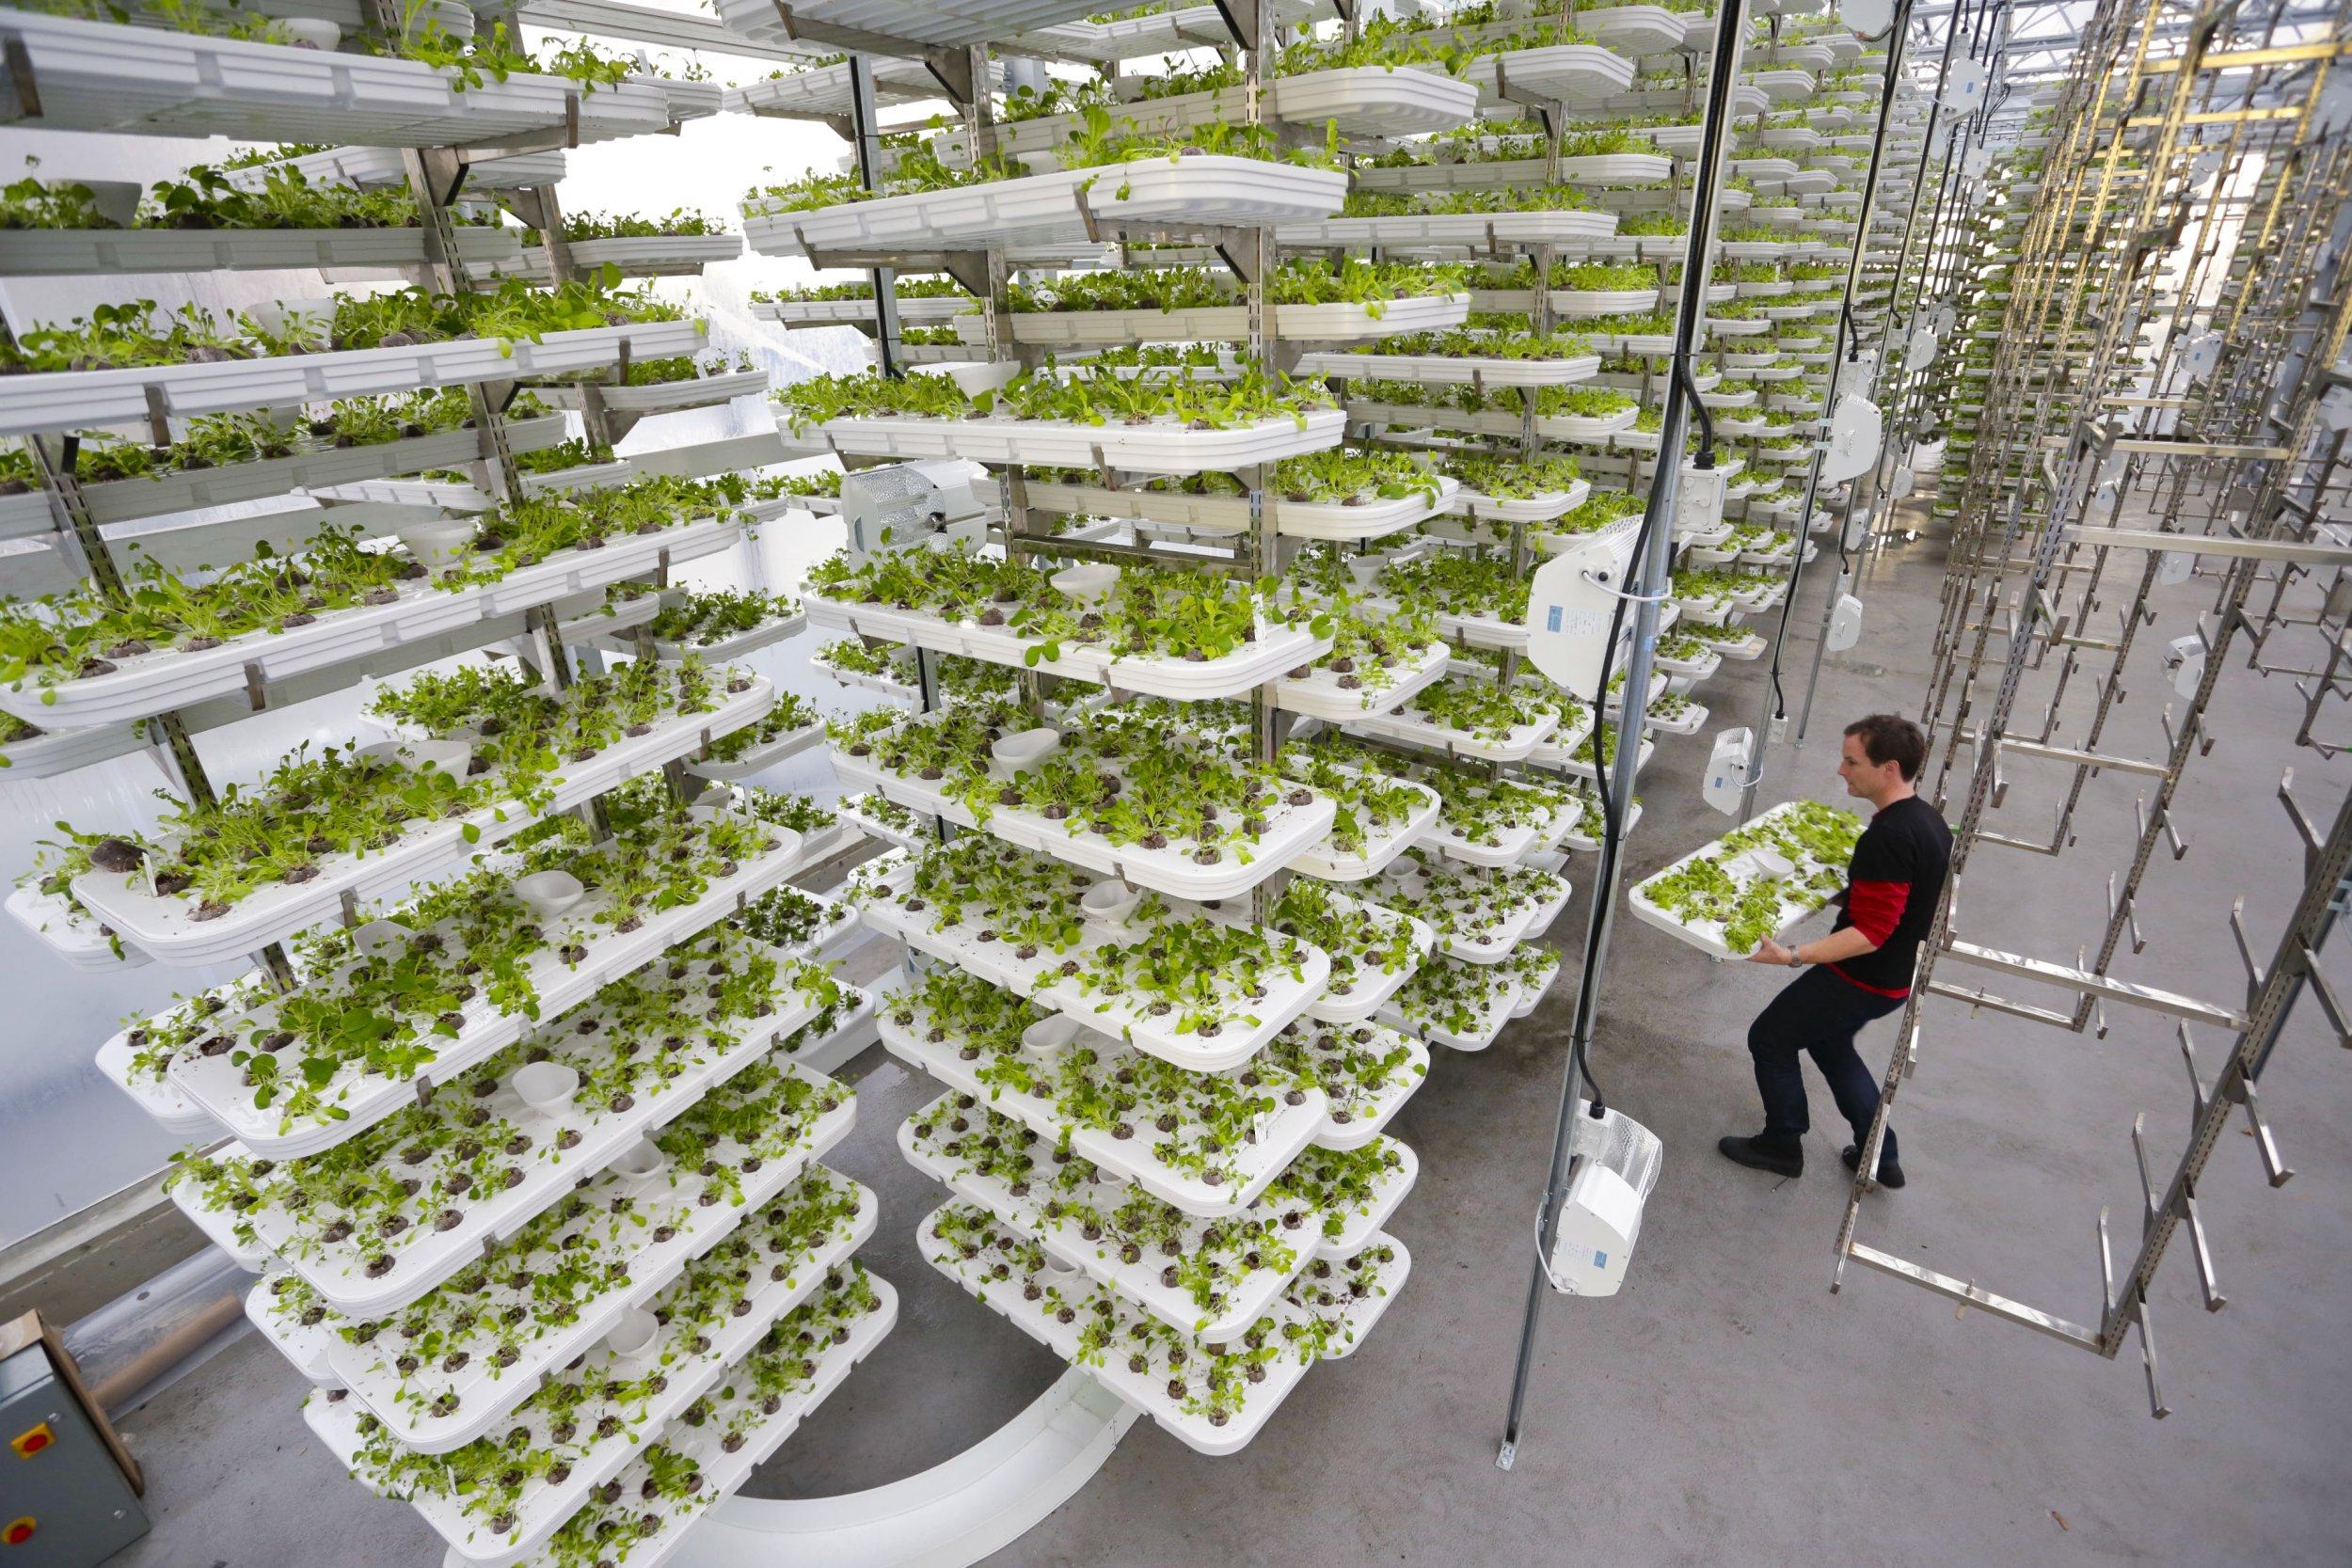 Vertical Farms Across The World